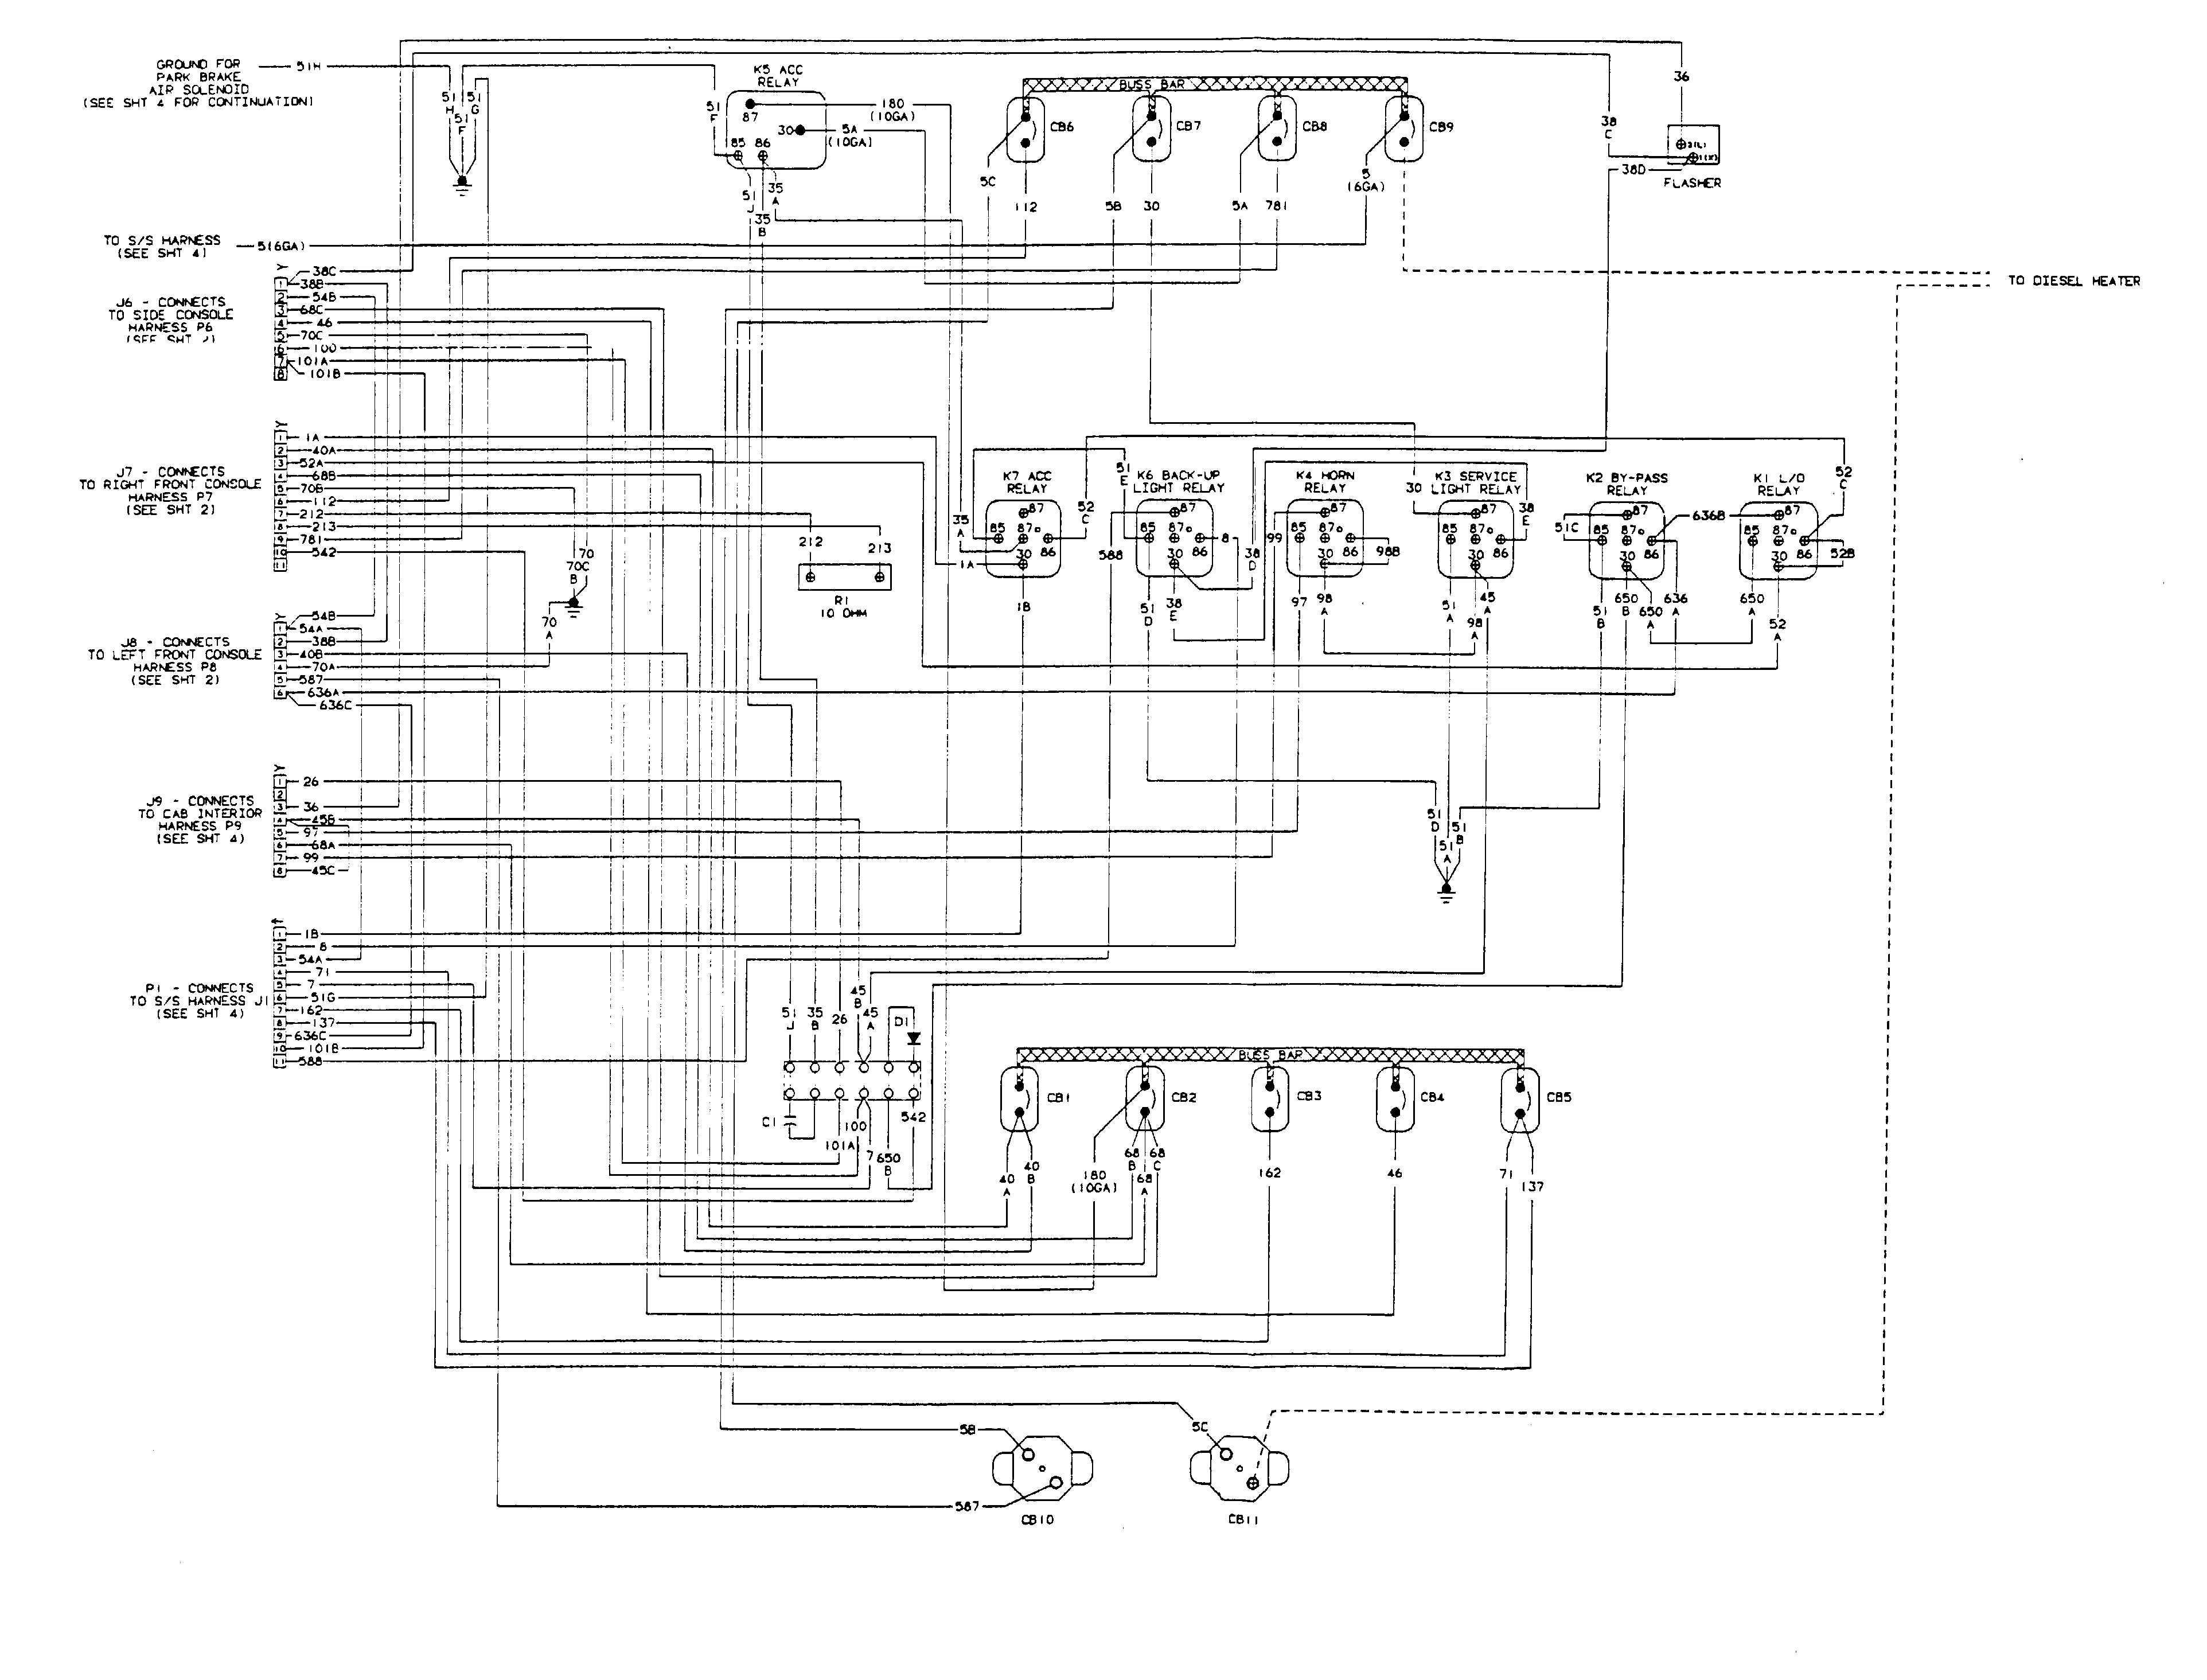 overhead crane control wiring diagram. Black Bedroom Furniture Sets. Home Design Ideas